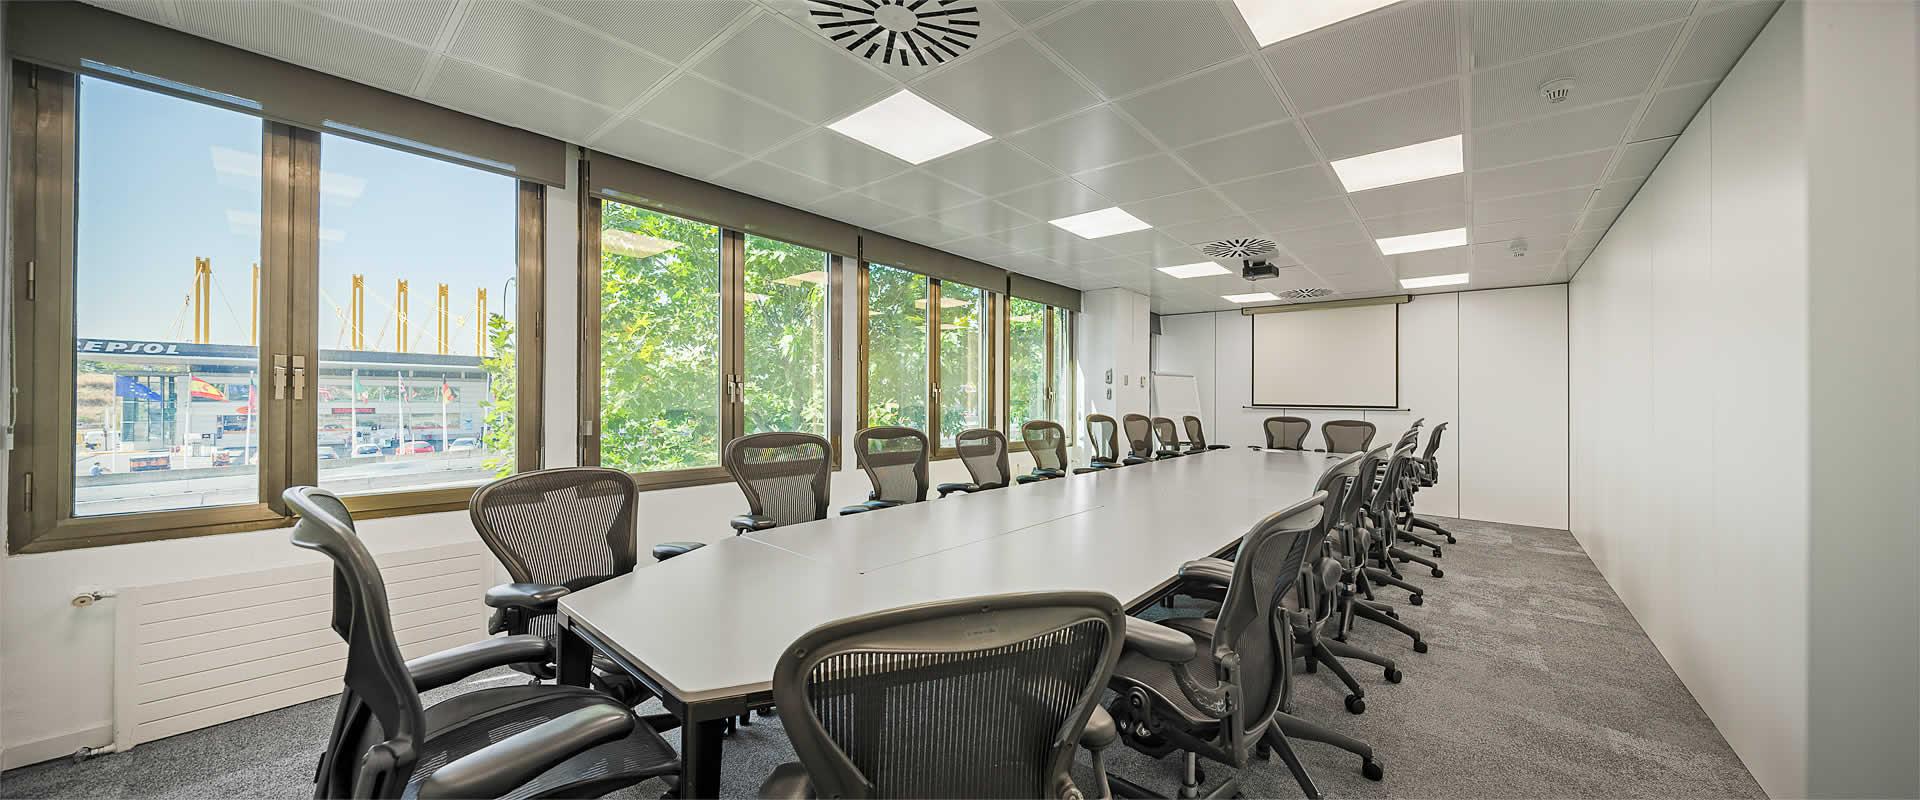 02-slide-oficinas-ideal